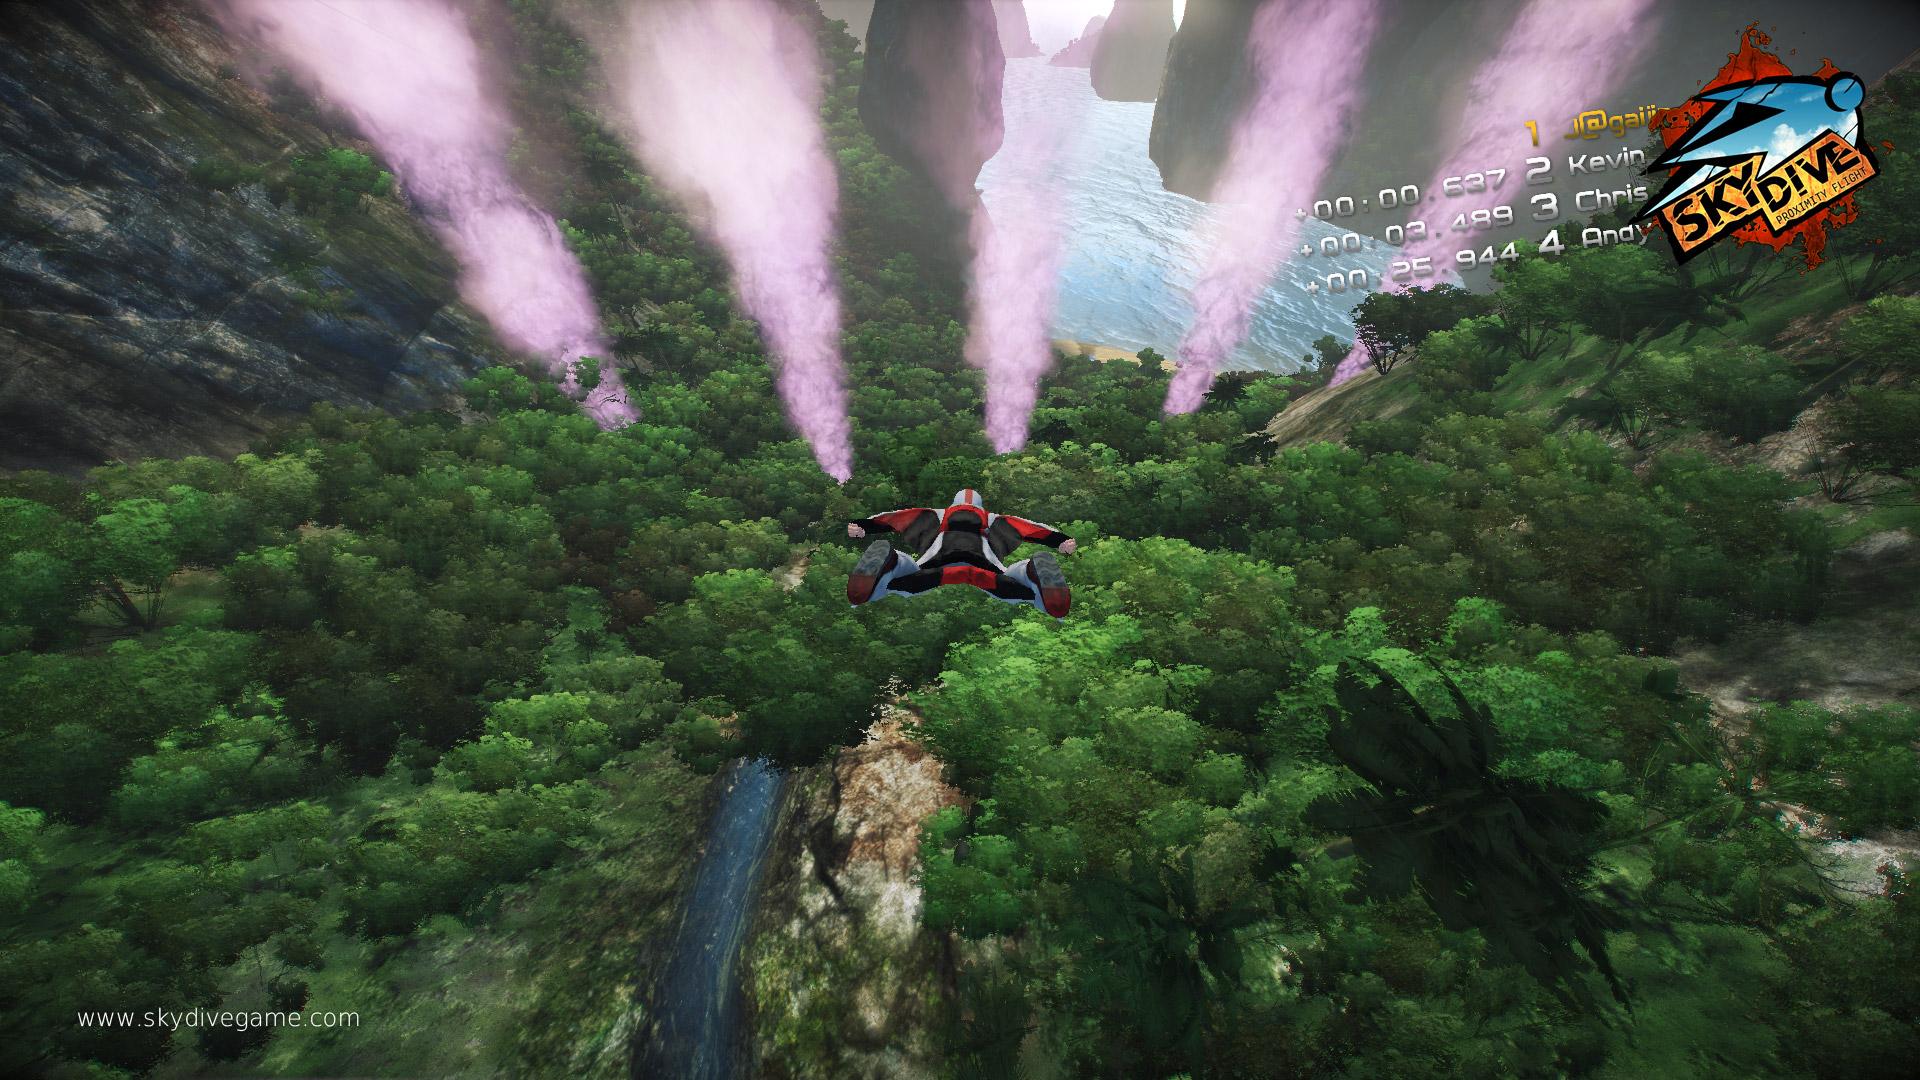 skydive_proximity_flight-34